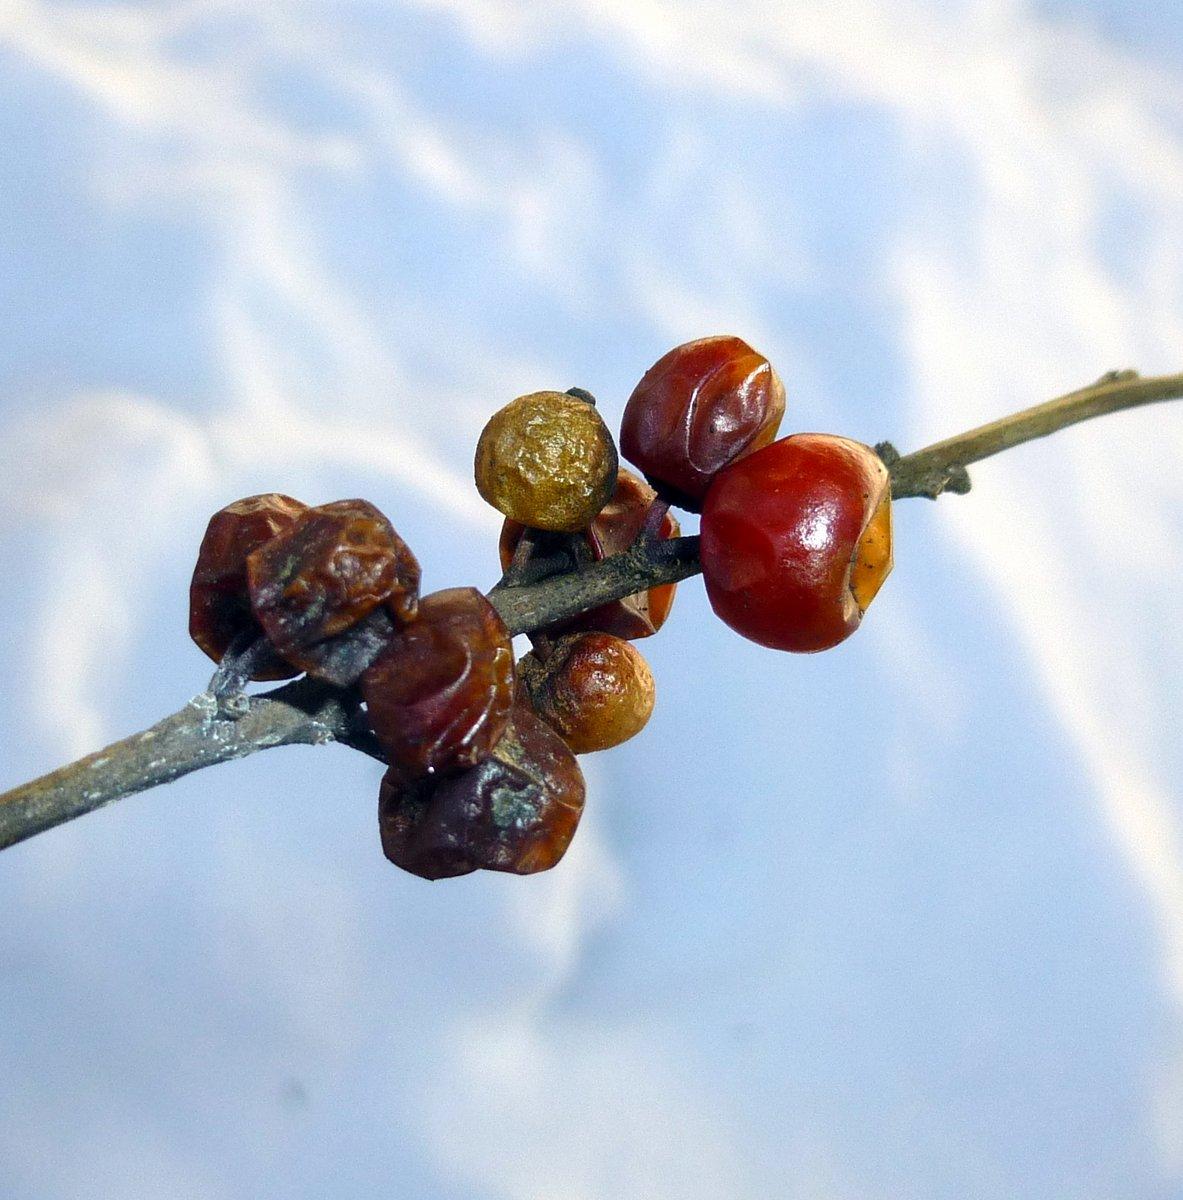 8. Winterberry Fruit